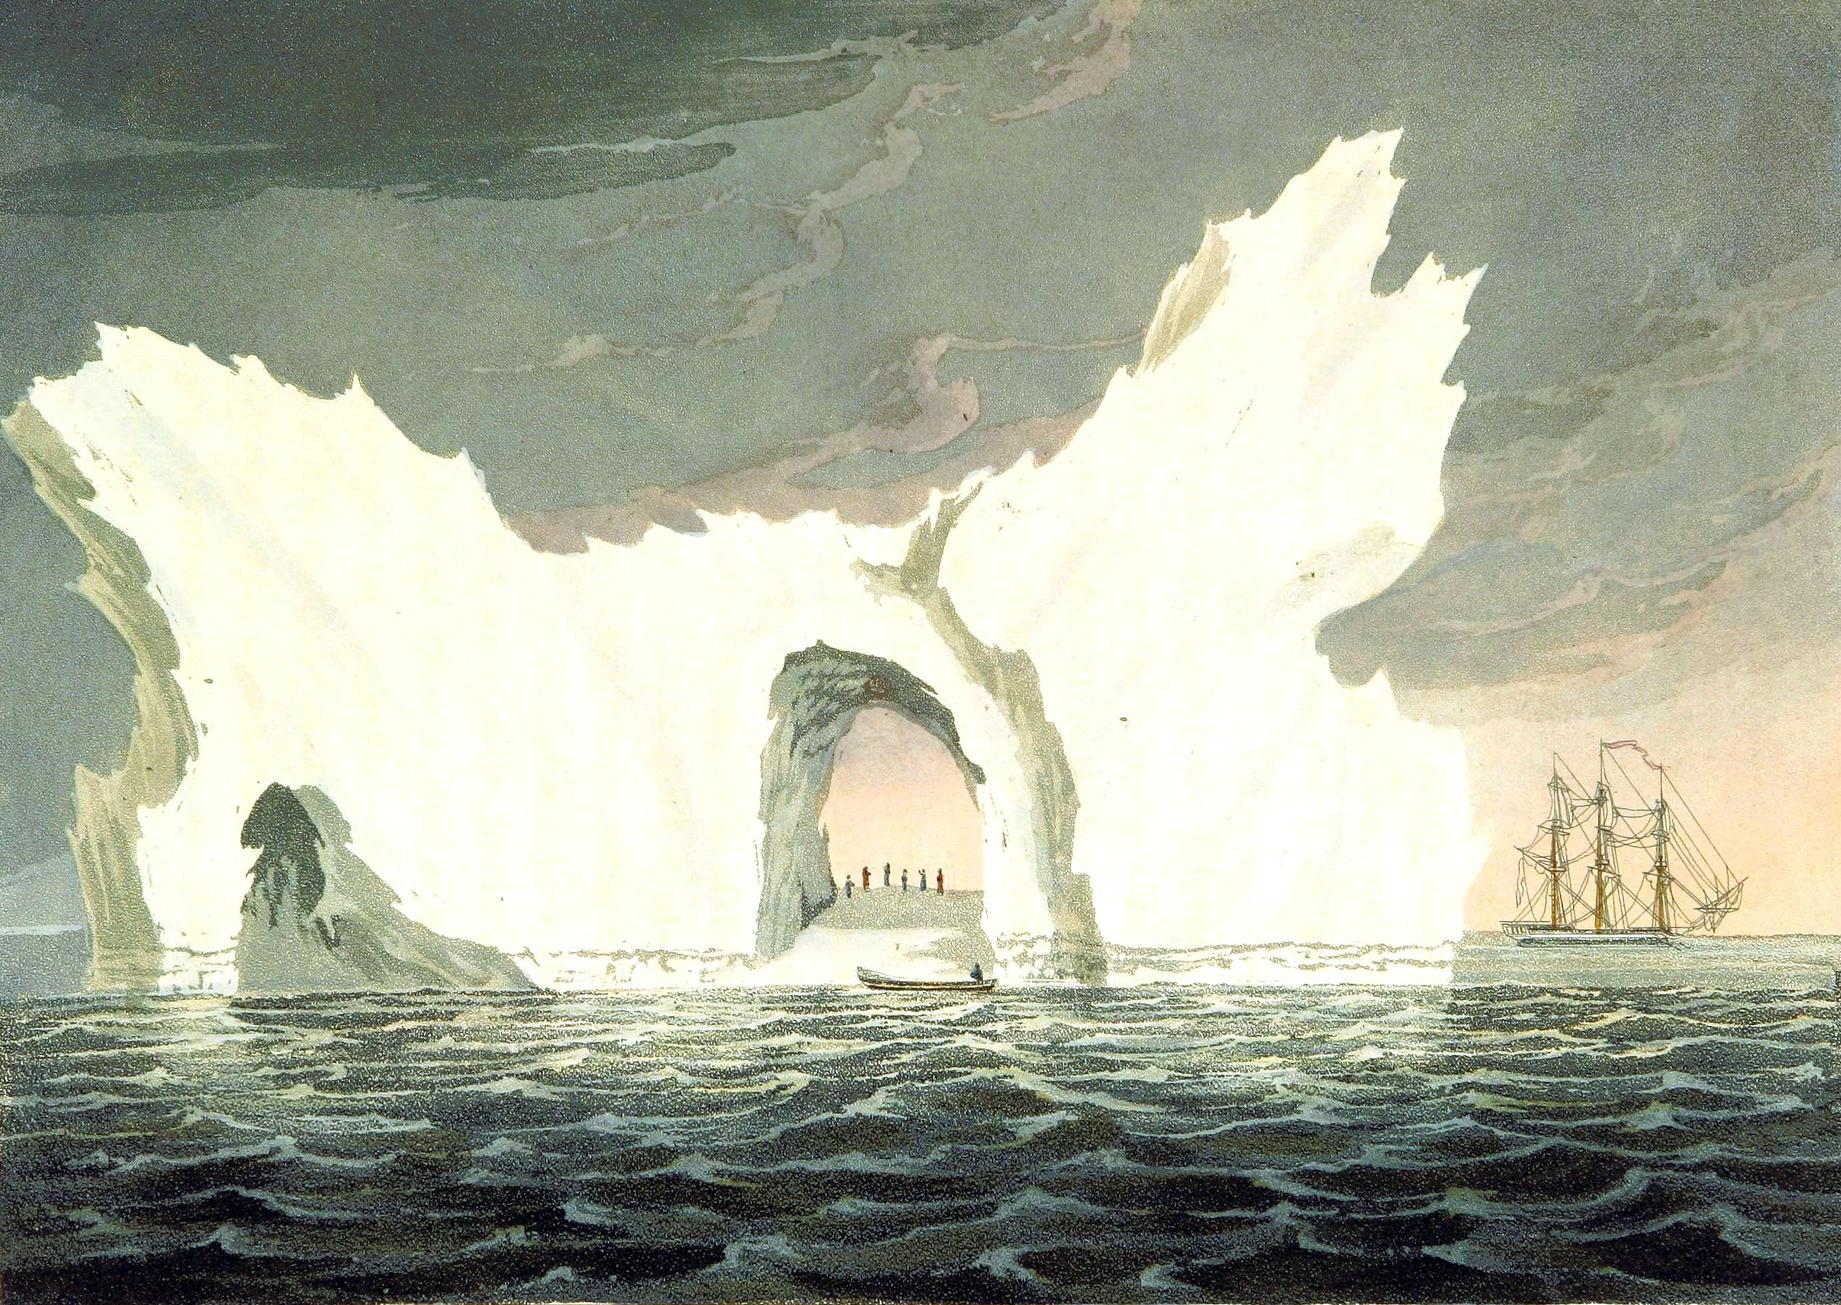 A FREE 19th-century iceberg illustration in the public domain